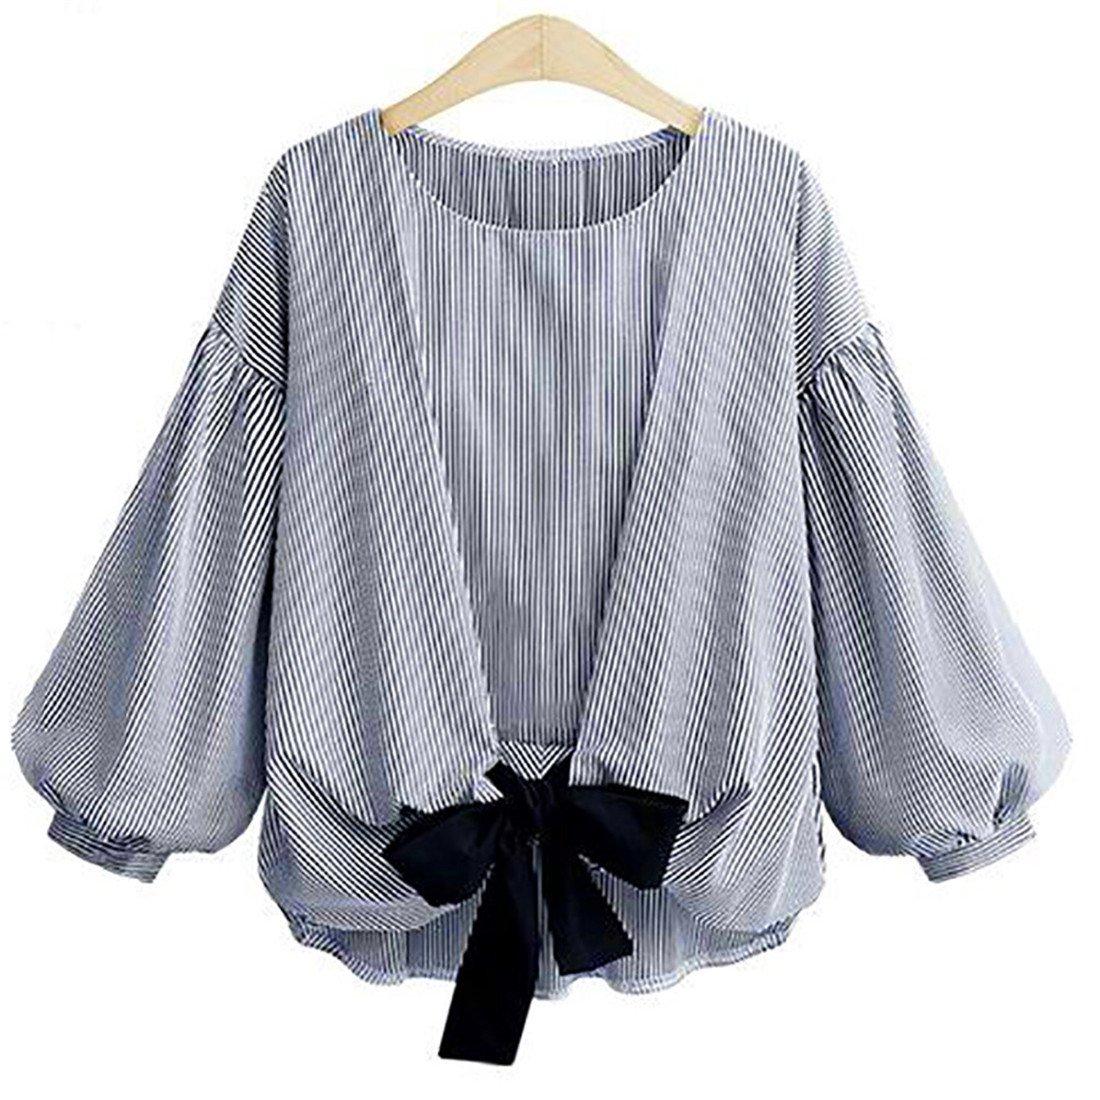 Womens Long Lantern Sleeve Plus Size Tops,YKA Girl Shirt Blouse for Ladies (White, L)